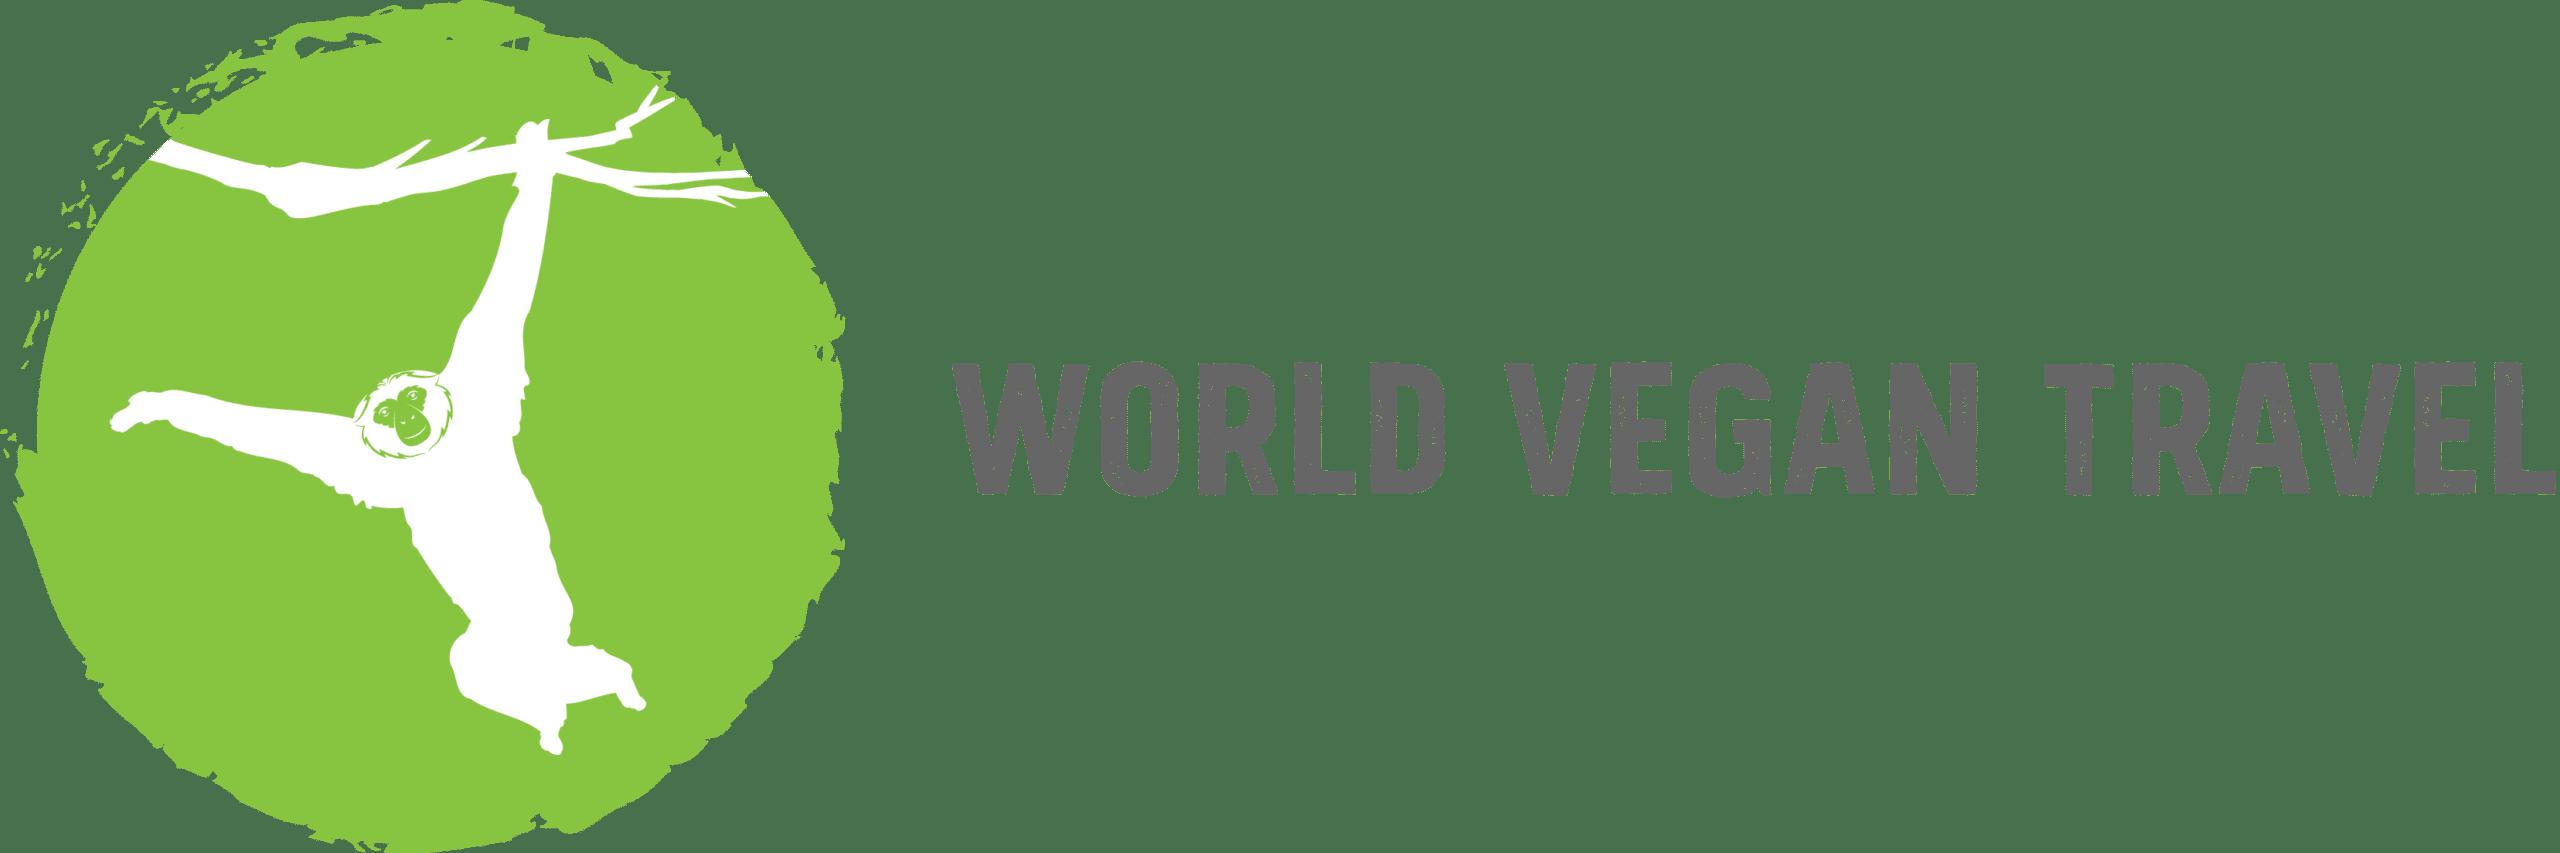 World Vegan Travel logo